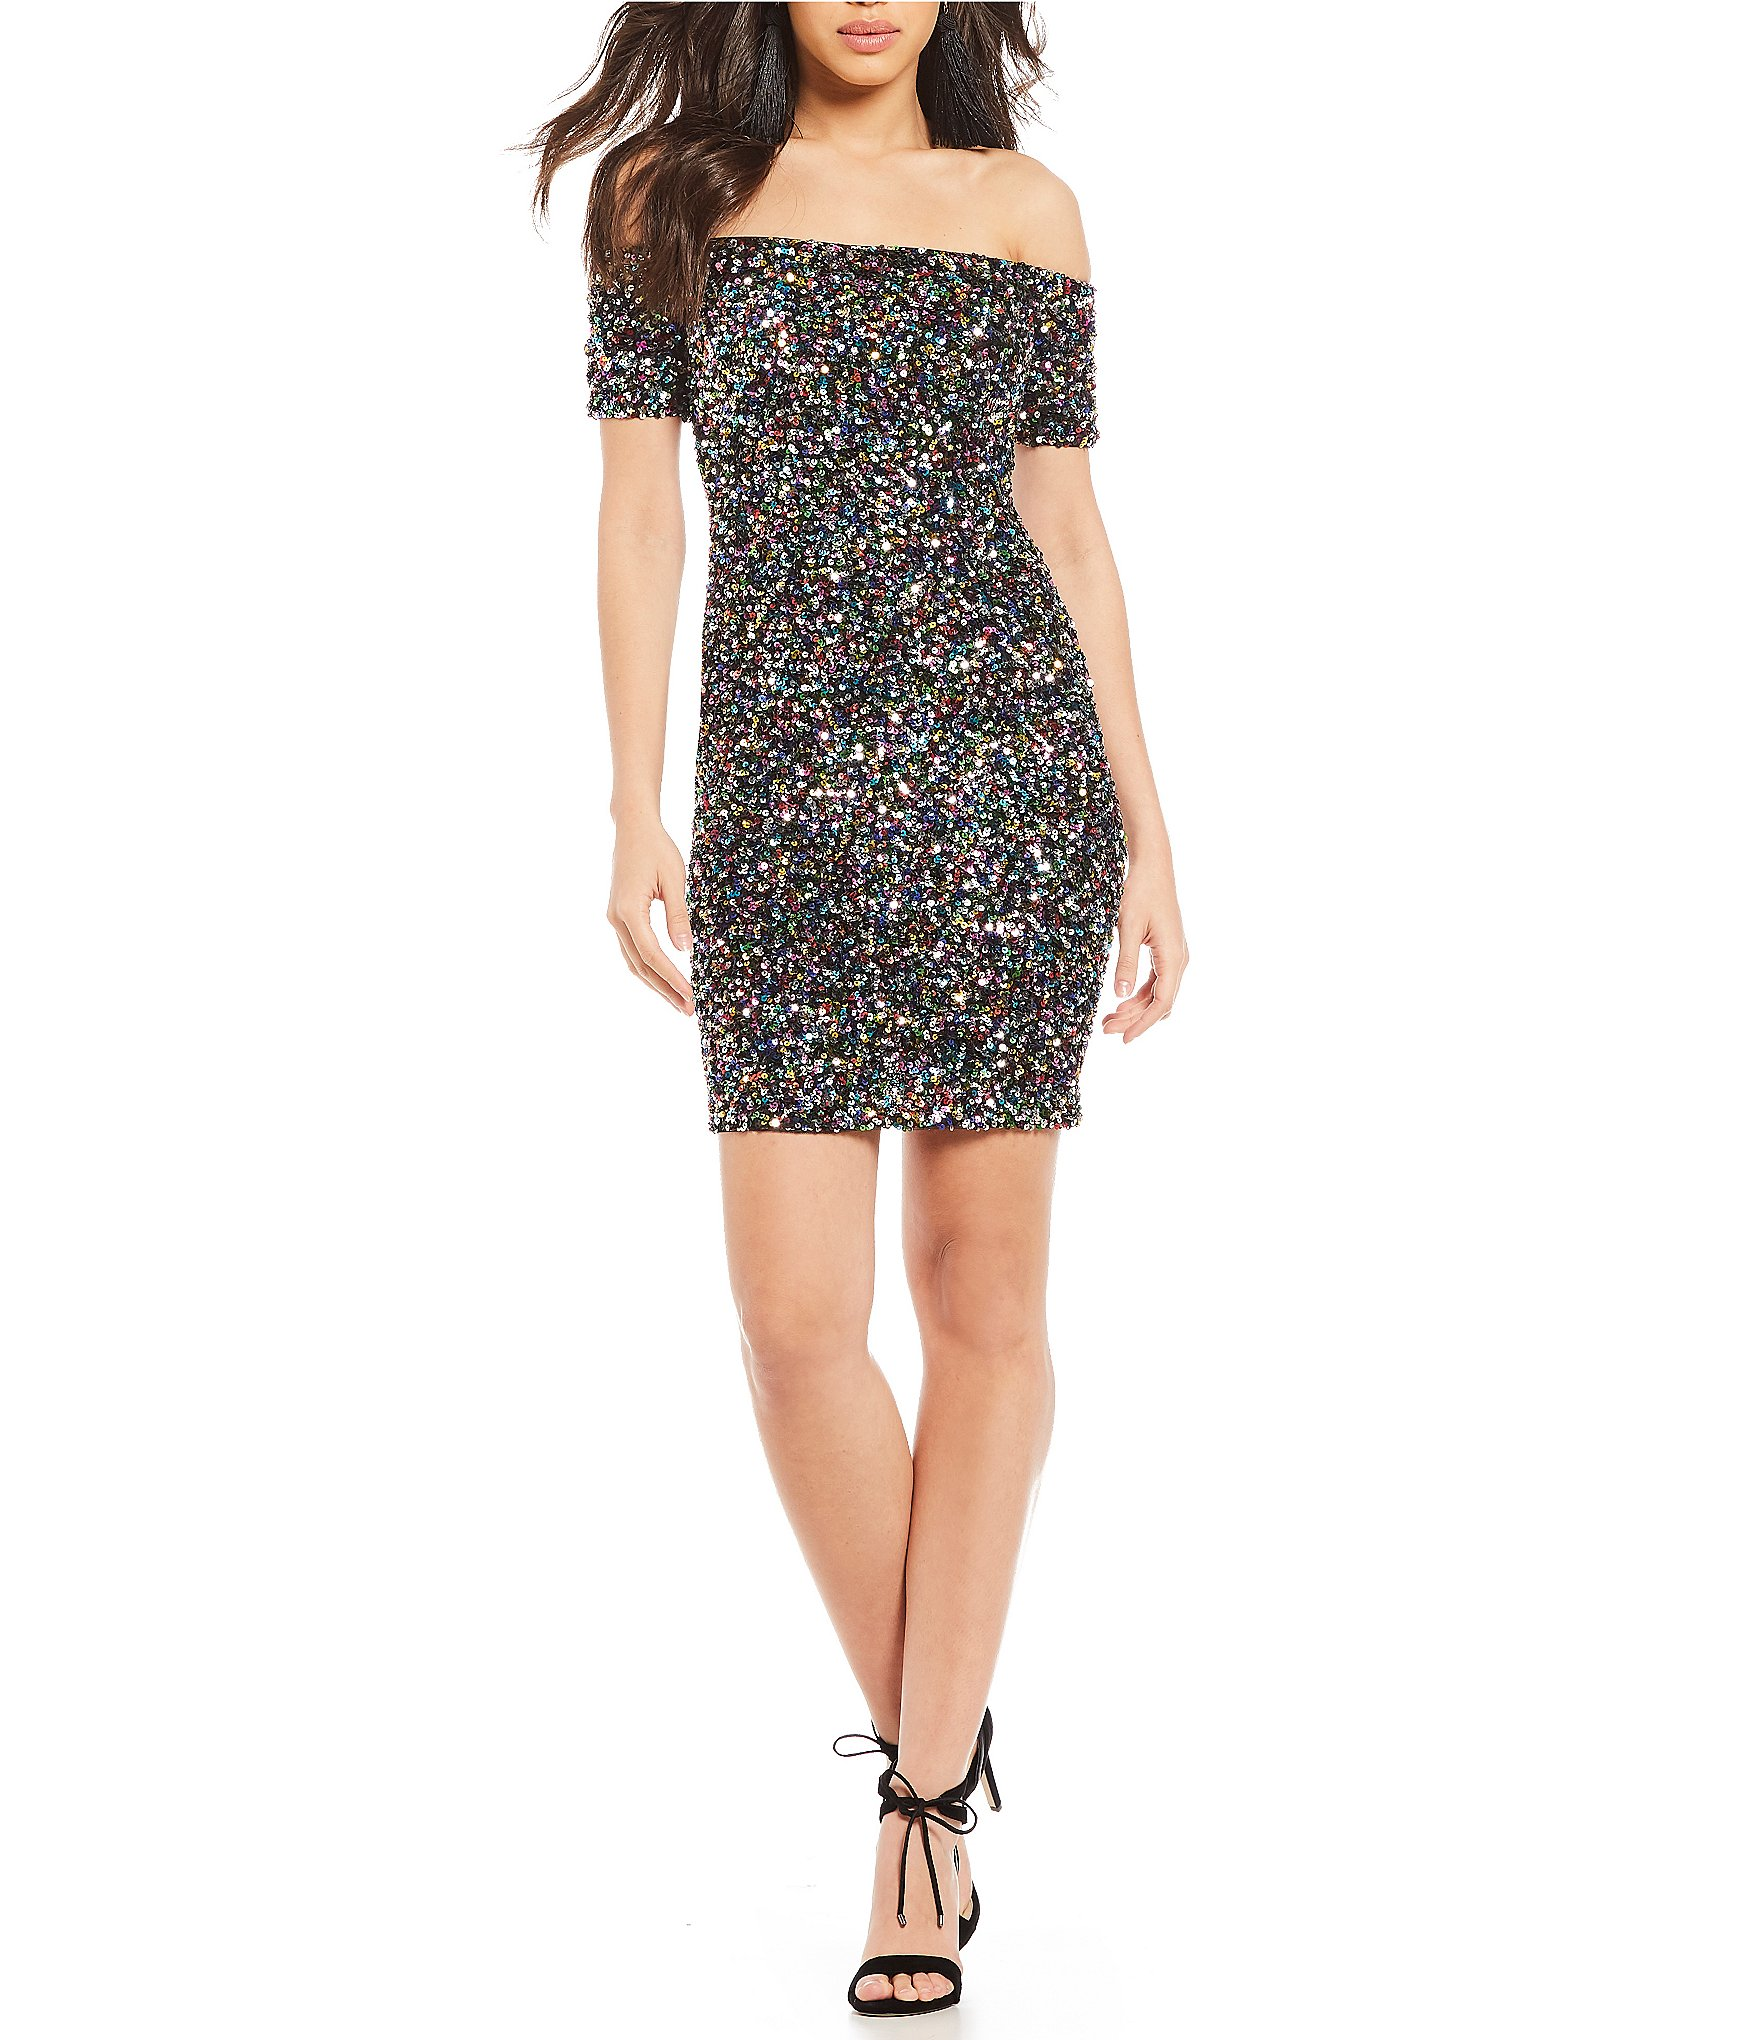 Gianni Bini Women\'s Dresses & Gowns | Dillards